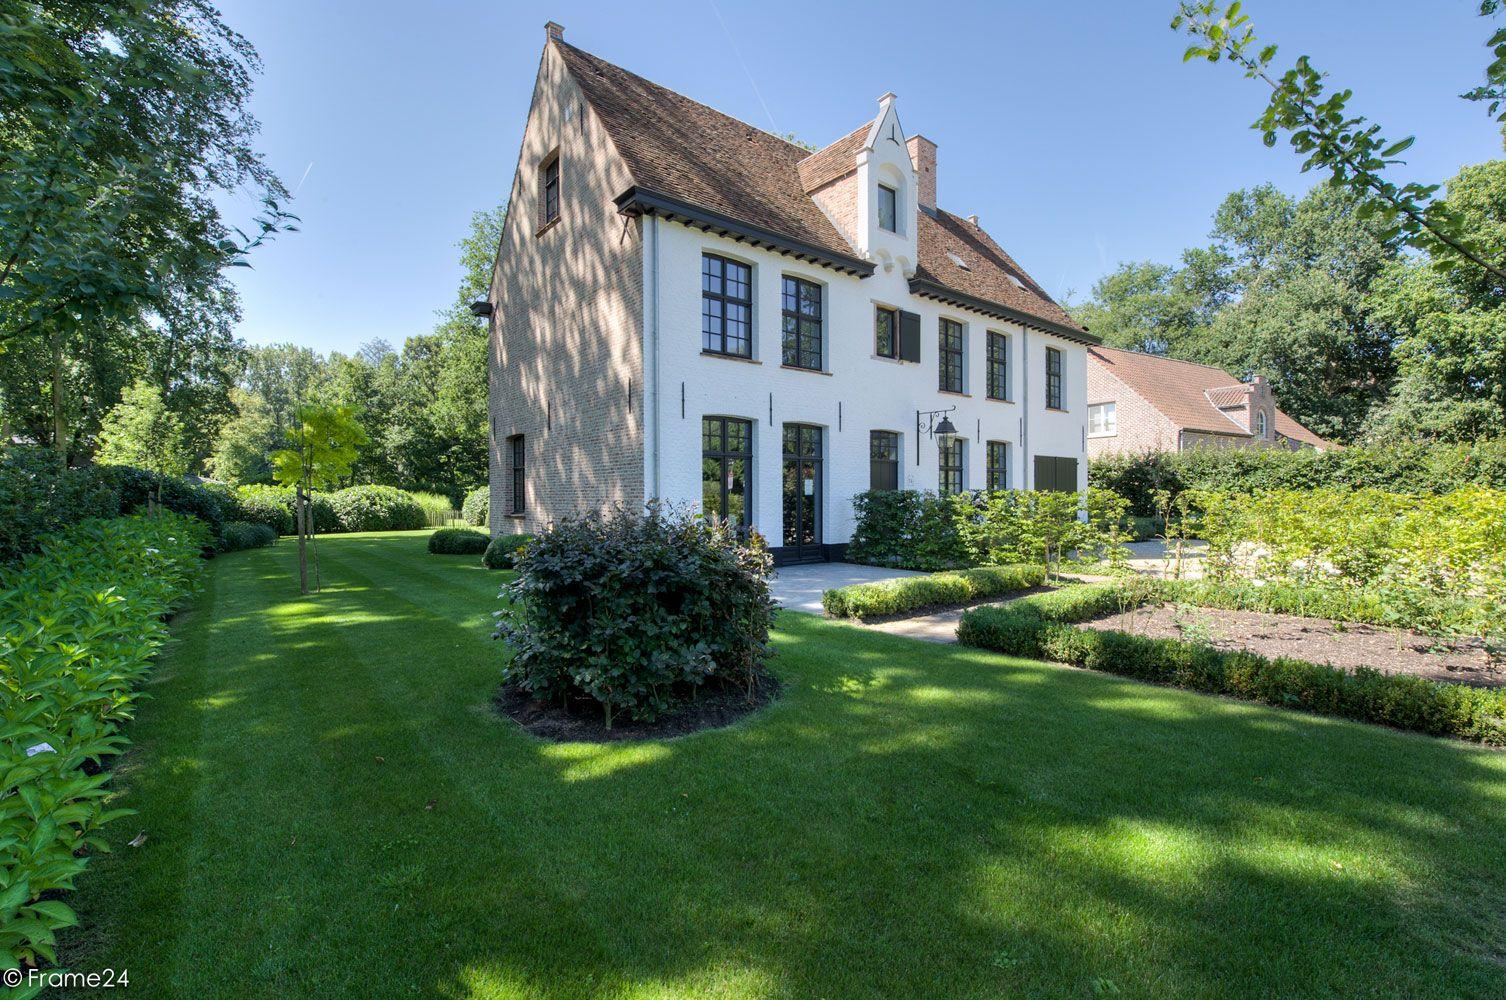 Villabouw vlassak verhulst exclusieve villabouw for Huizen architectuur